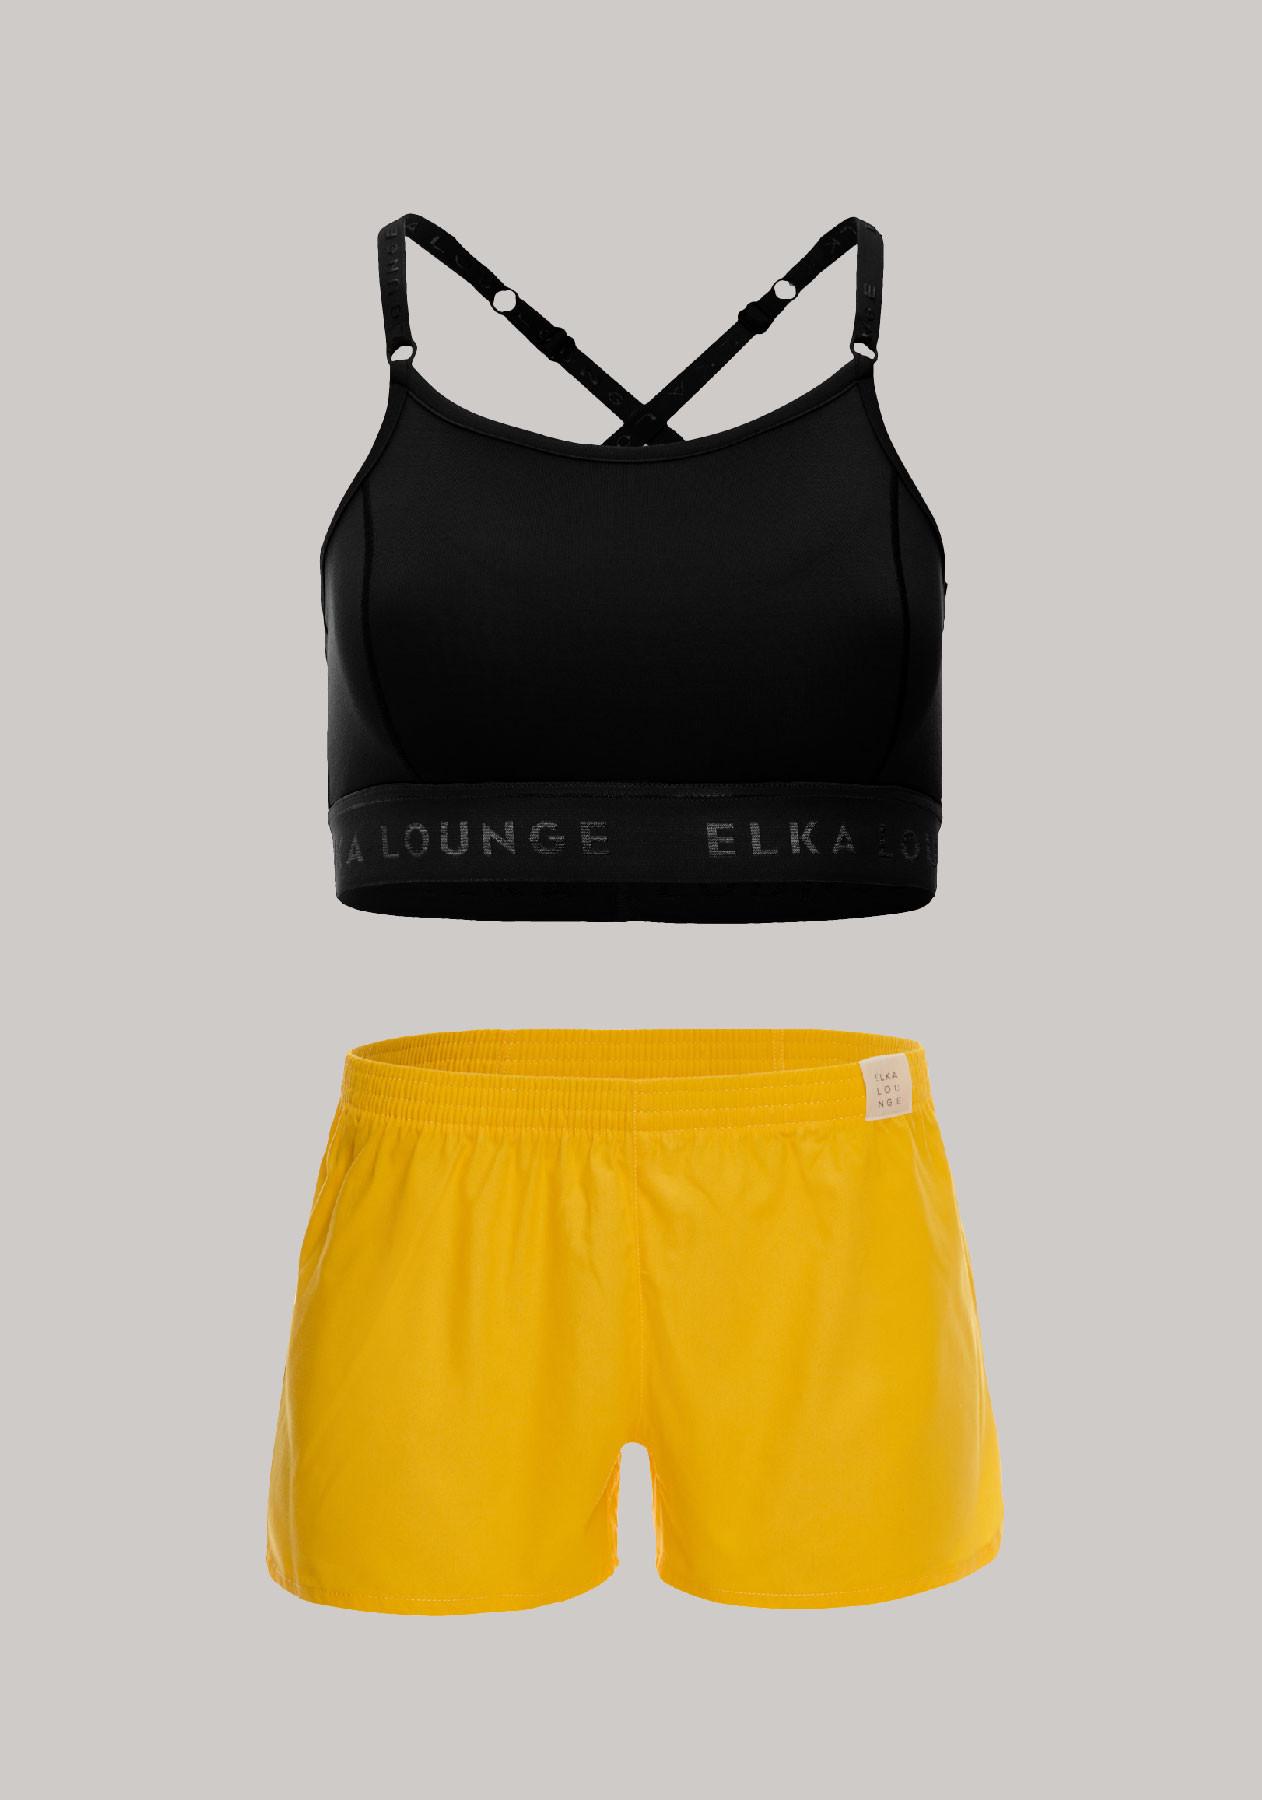 Women-boxershorts, bras-ELKA-Lounge-W00589,568